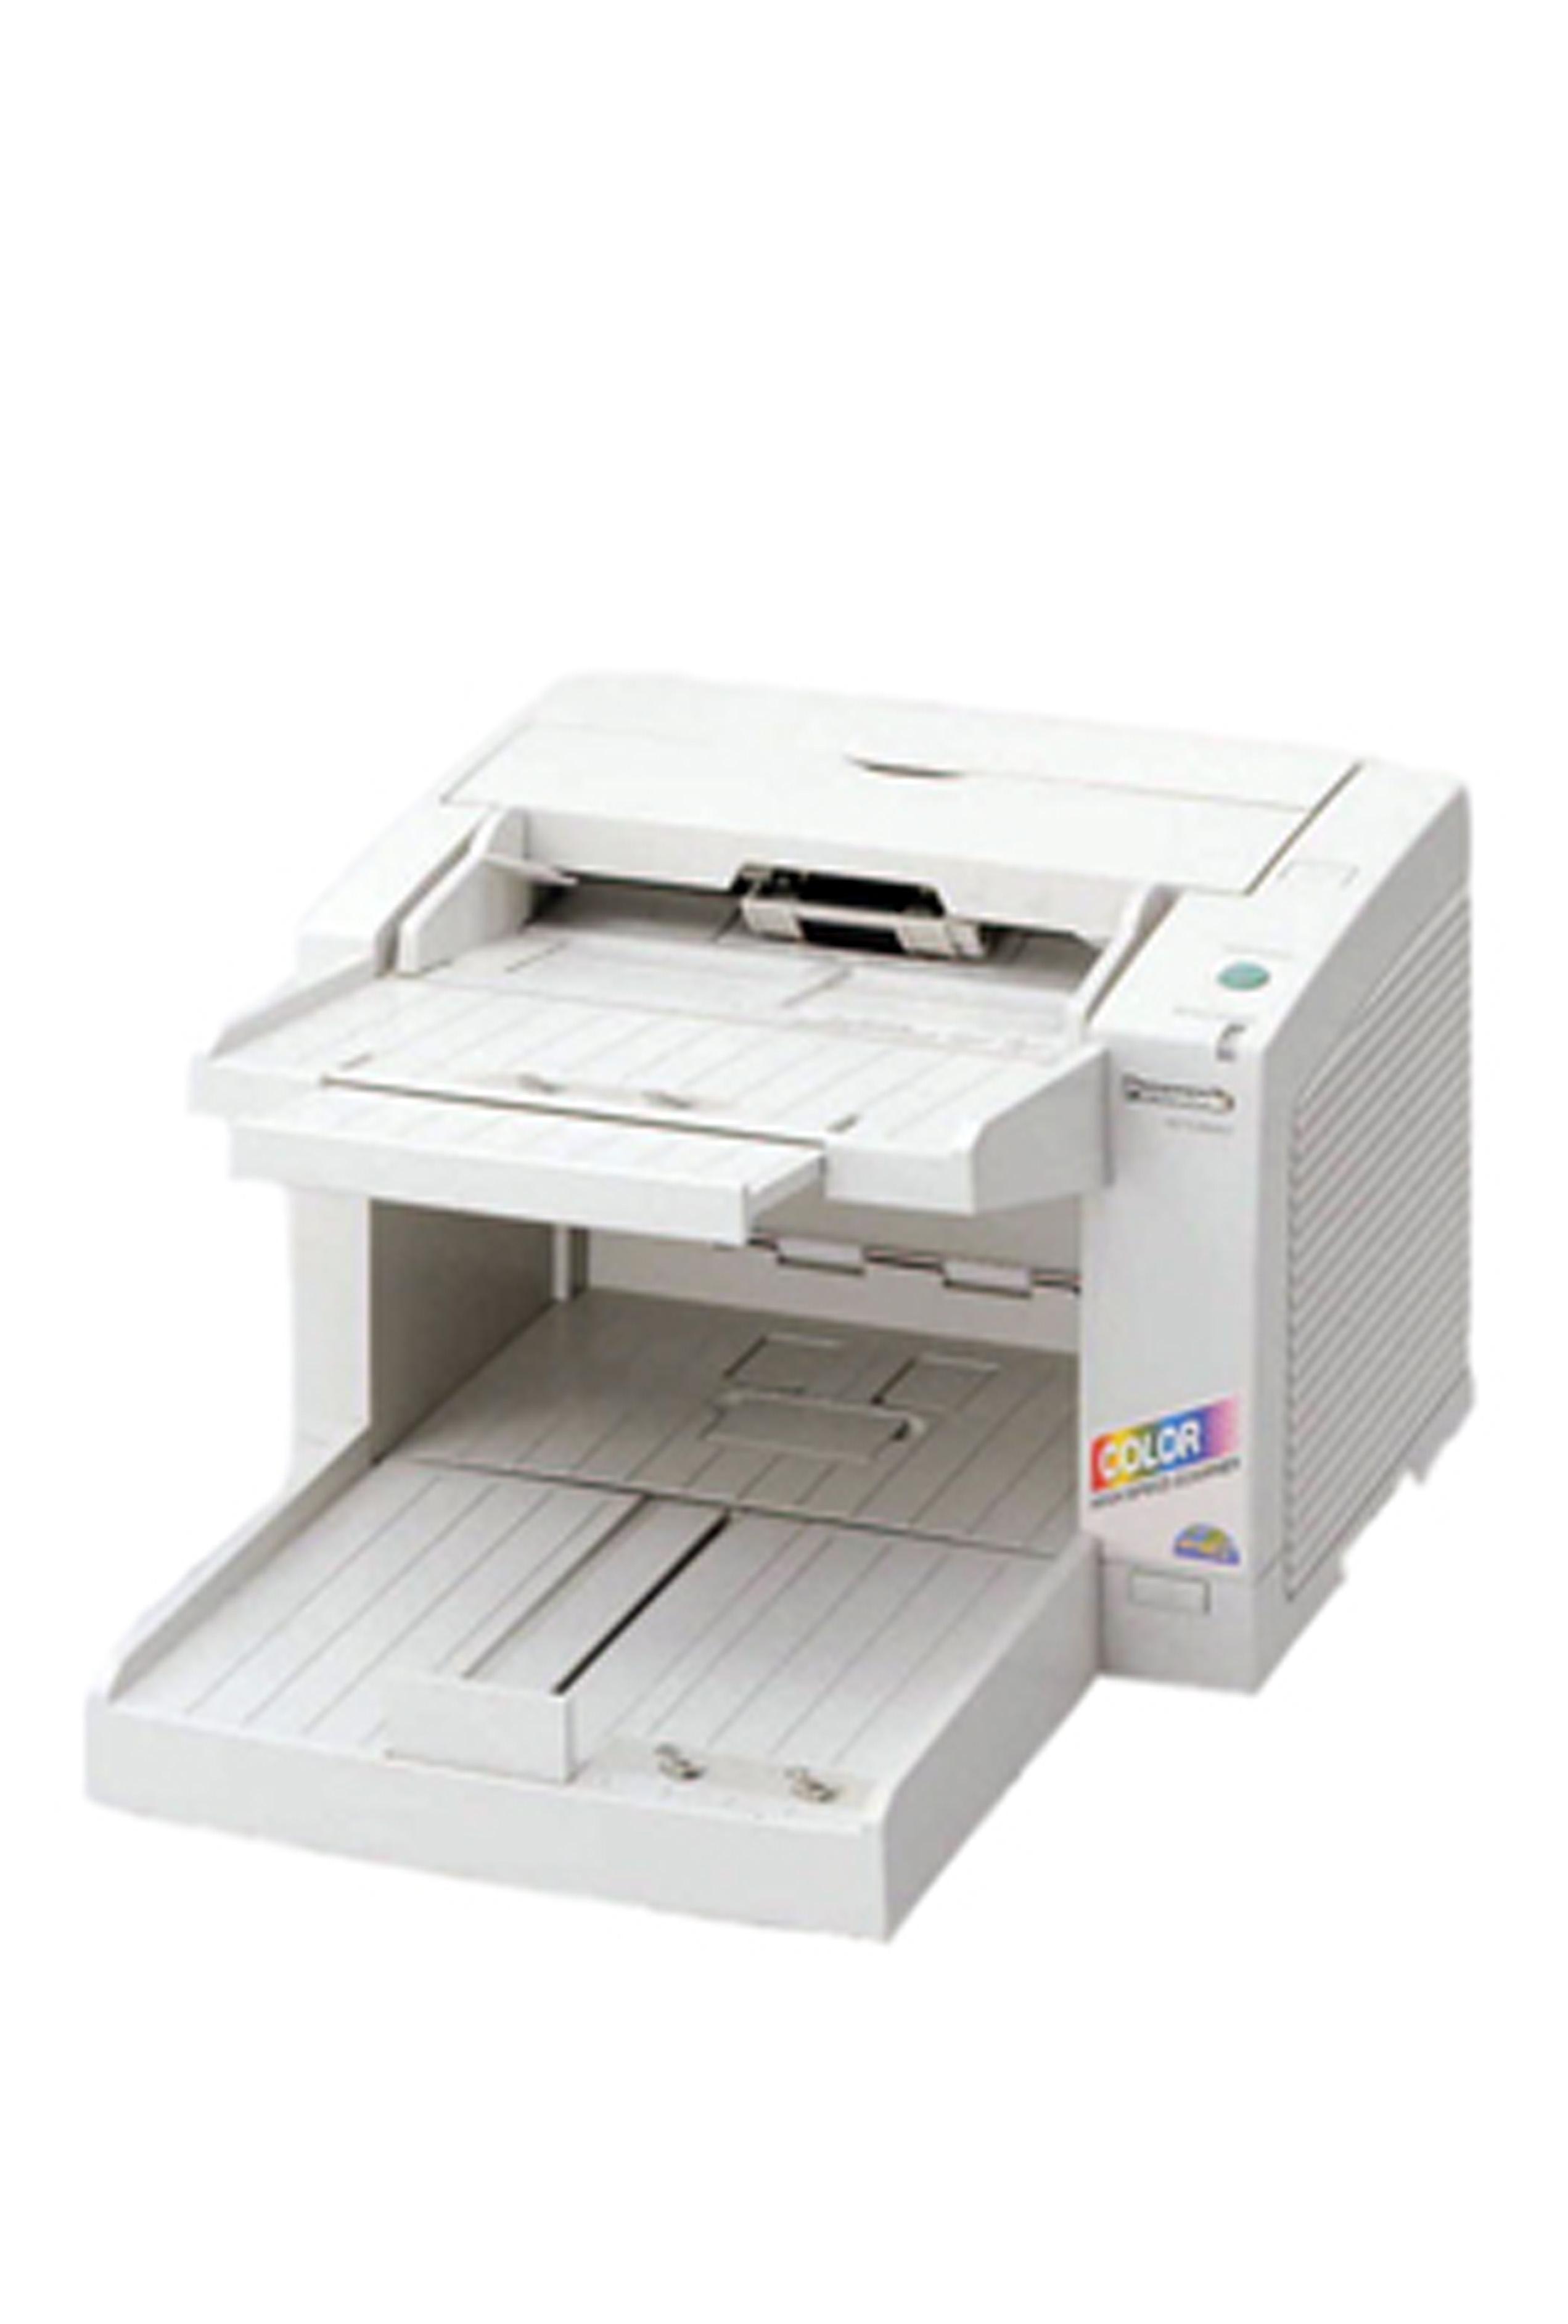 Panasonic KV-S2046C Departmental...